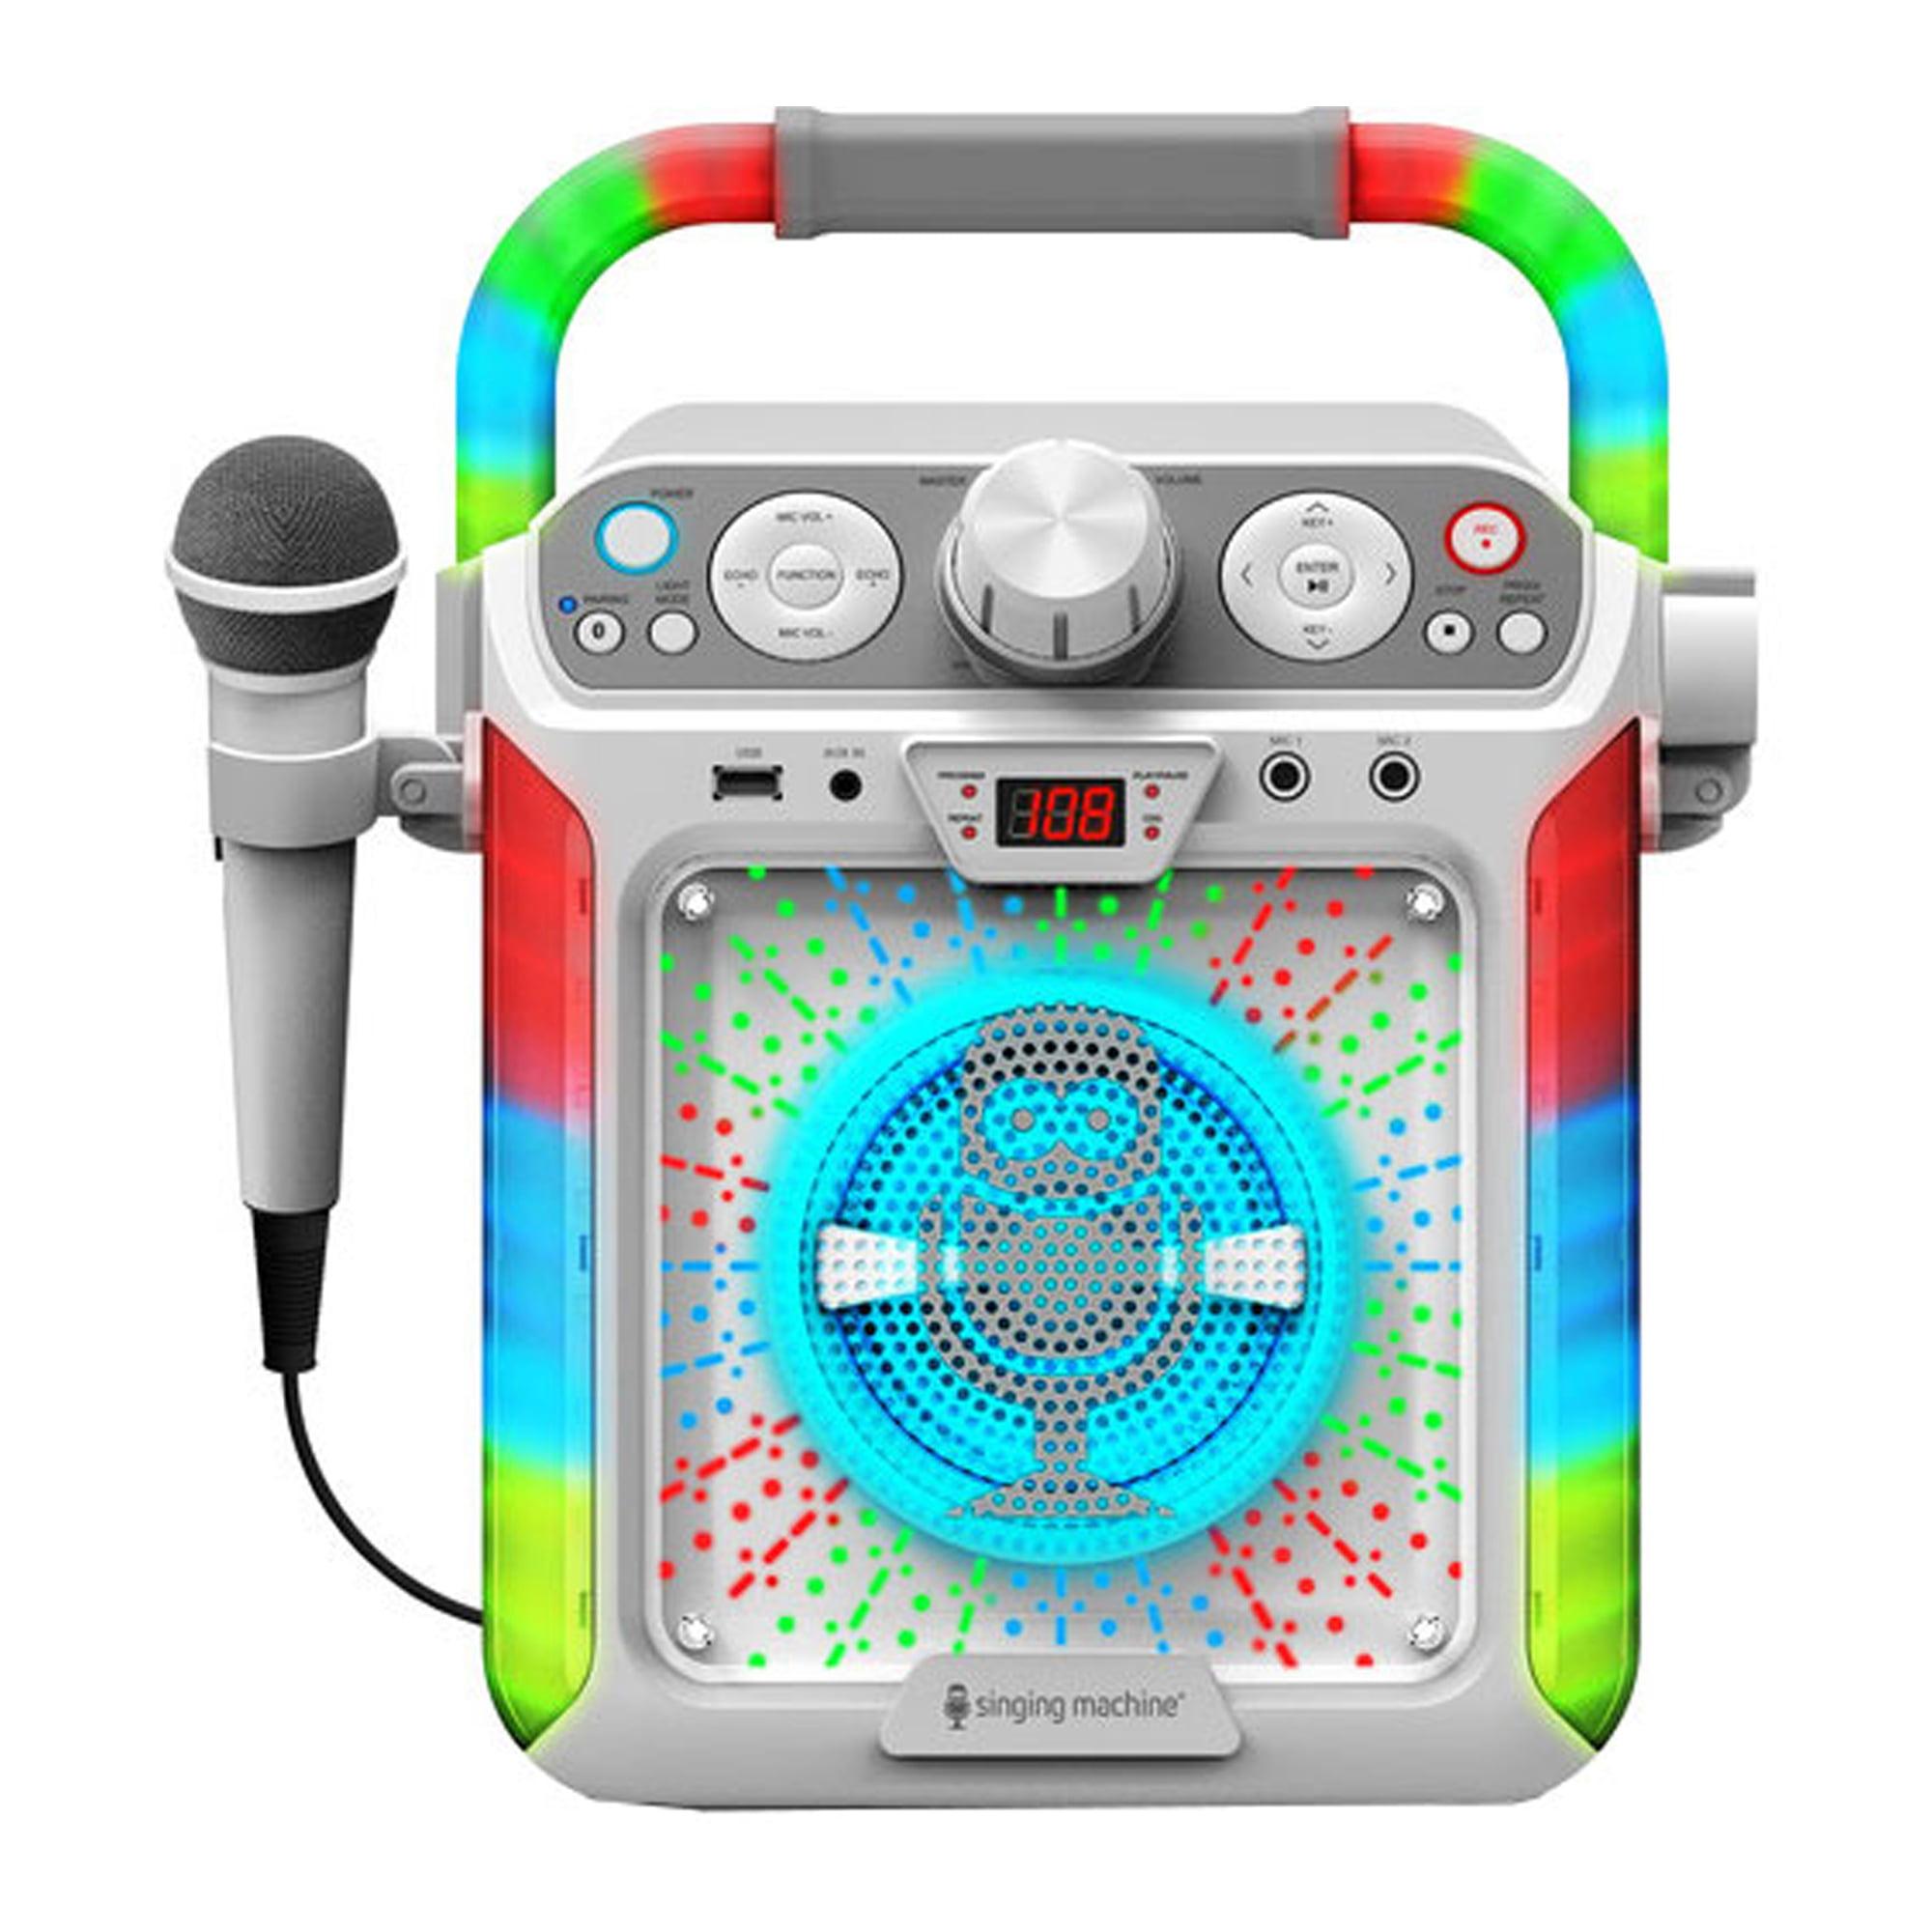 Singing Machine - Groove Cube CDG Karaoke System Plus Bluetooth, Black